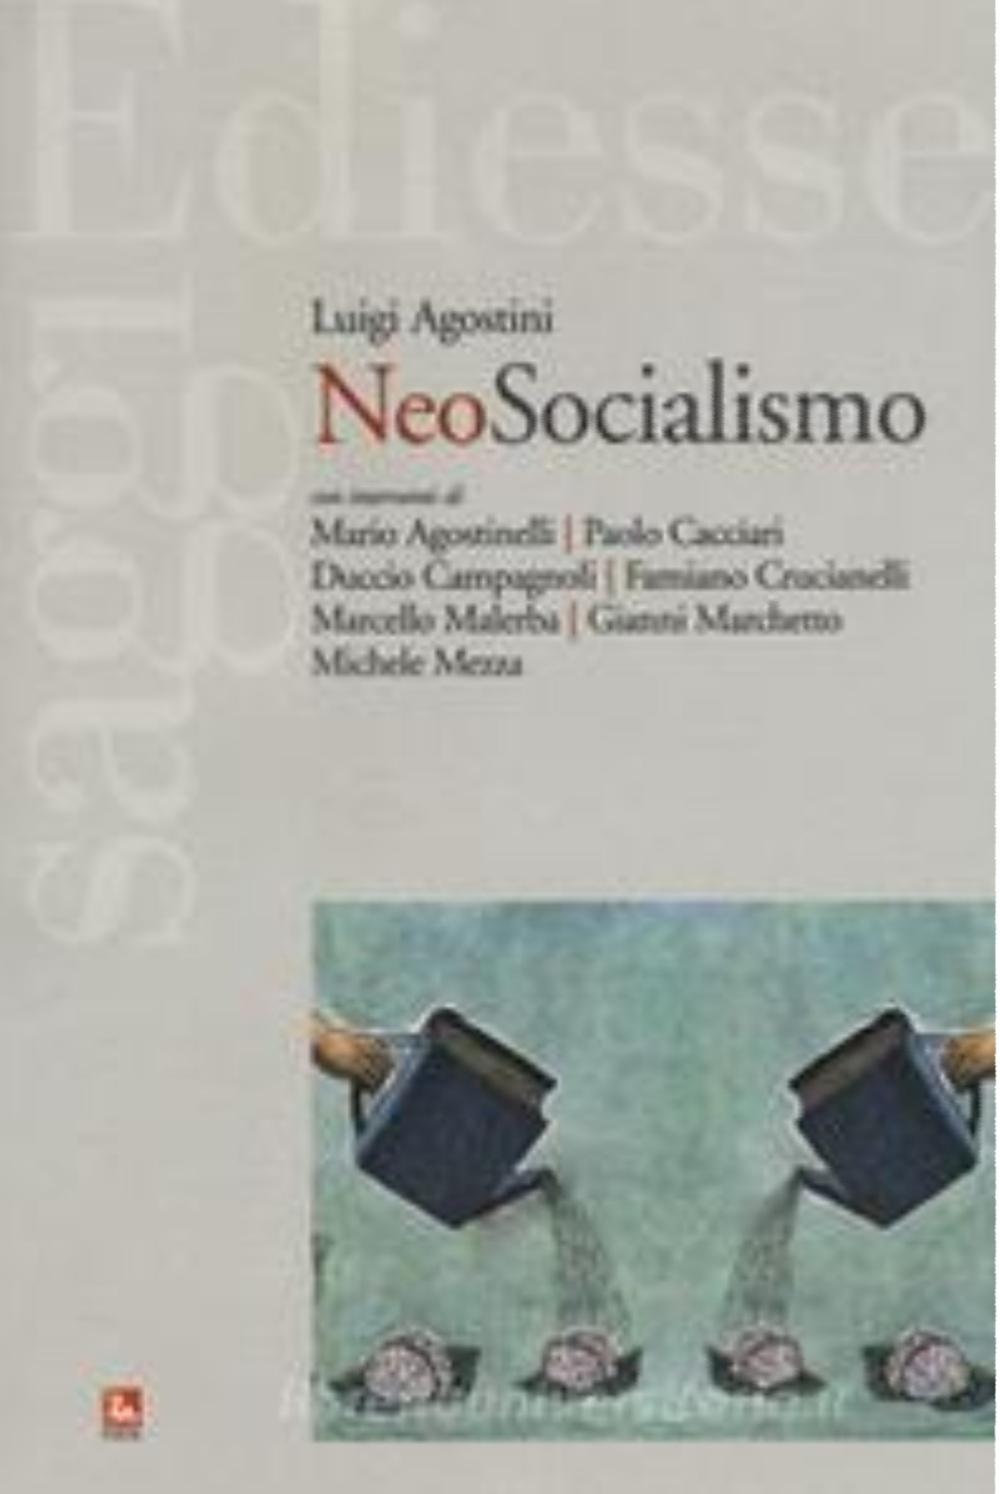 Neosocialismo-Luigi Agostini